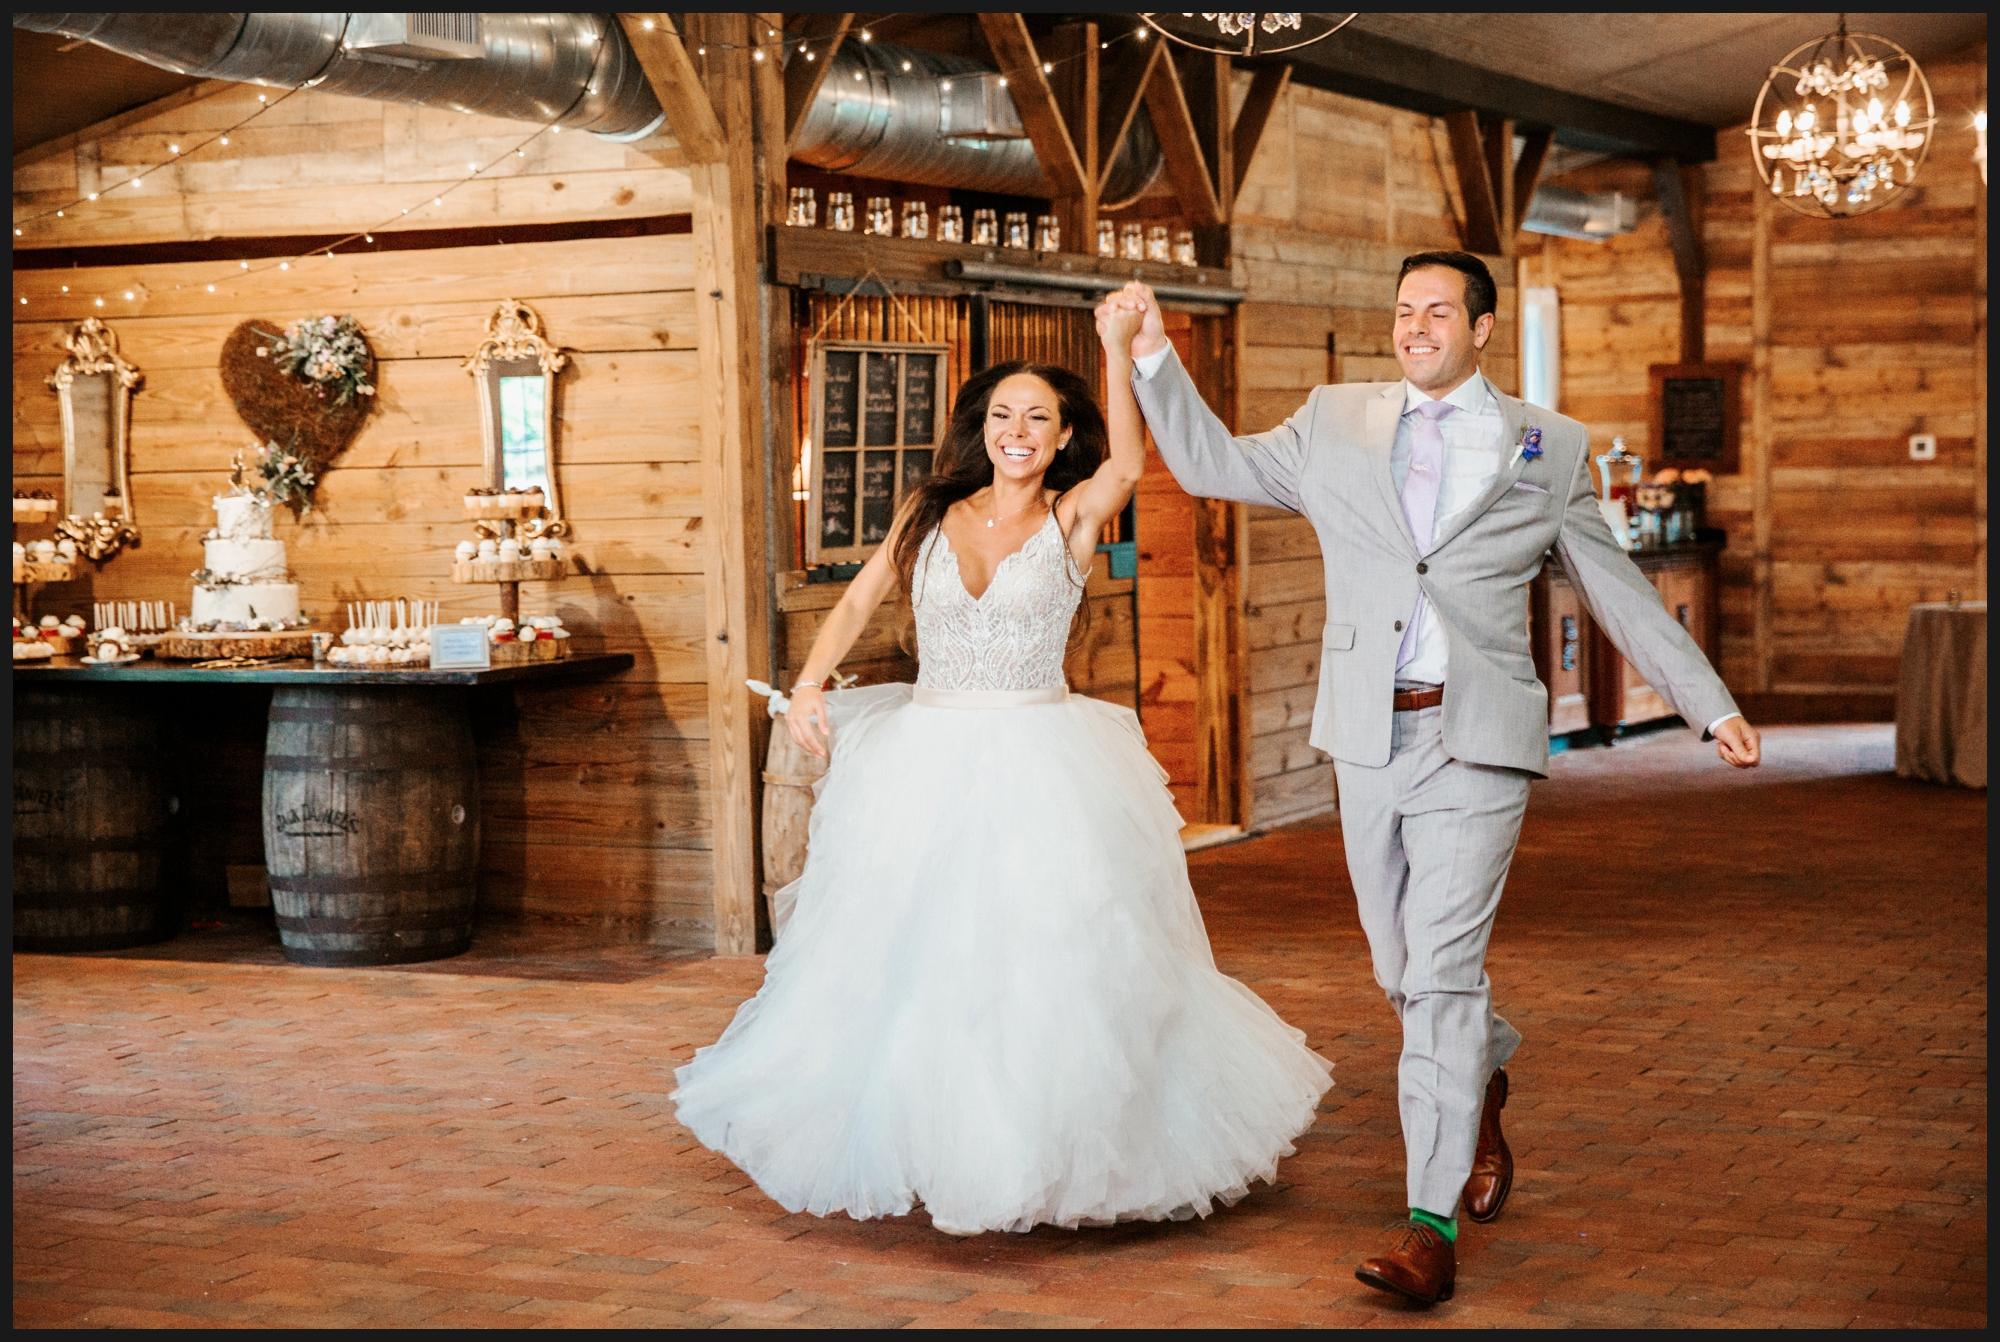 Orlando-Wedding-Photographer-destination-wedding-photographer-florida-wedding-photographer-bohemian-wedding-photographer_1636.jpg